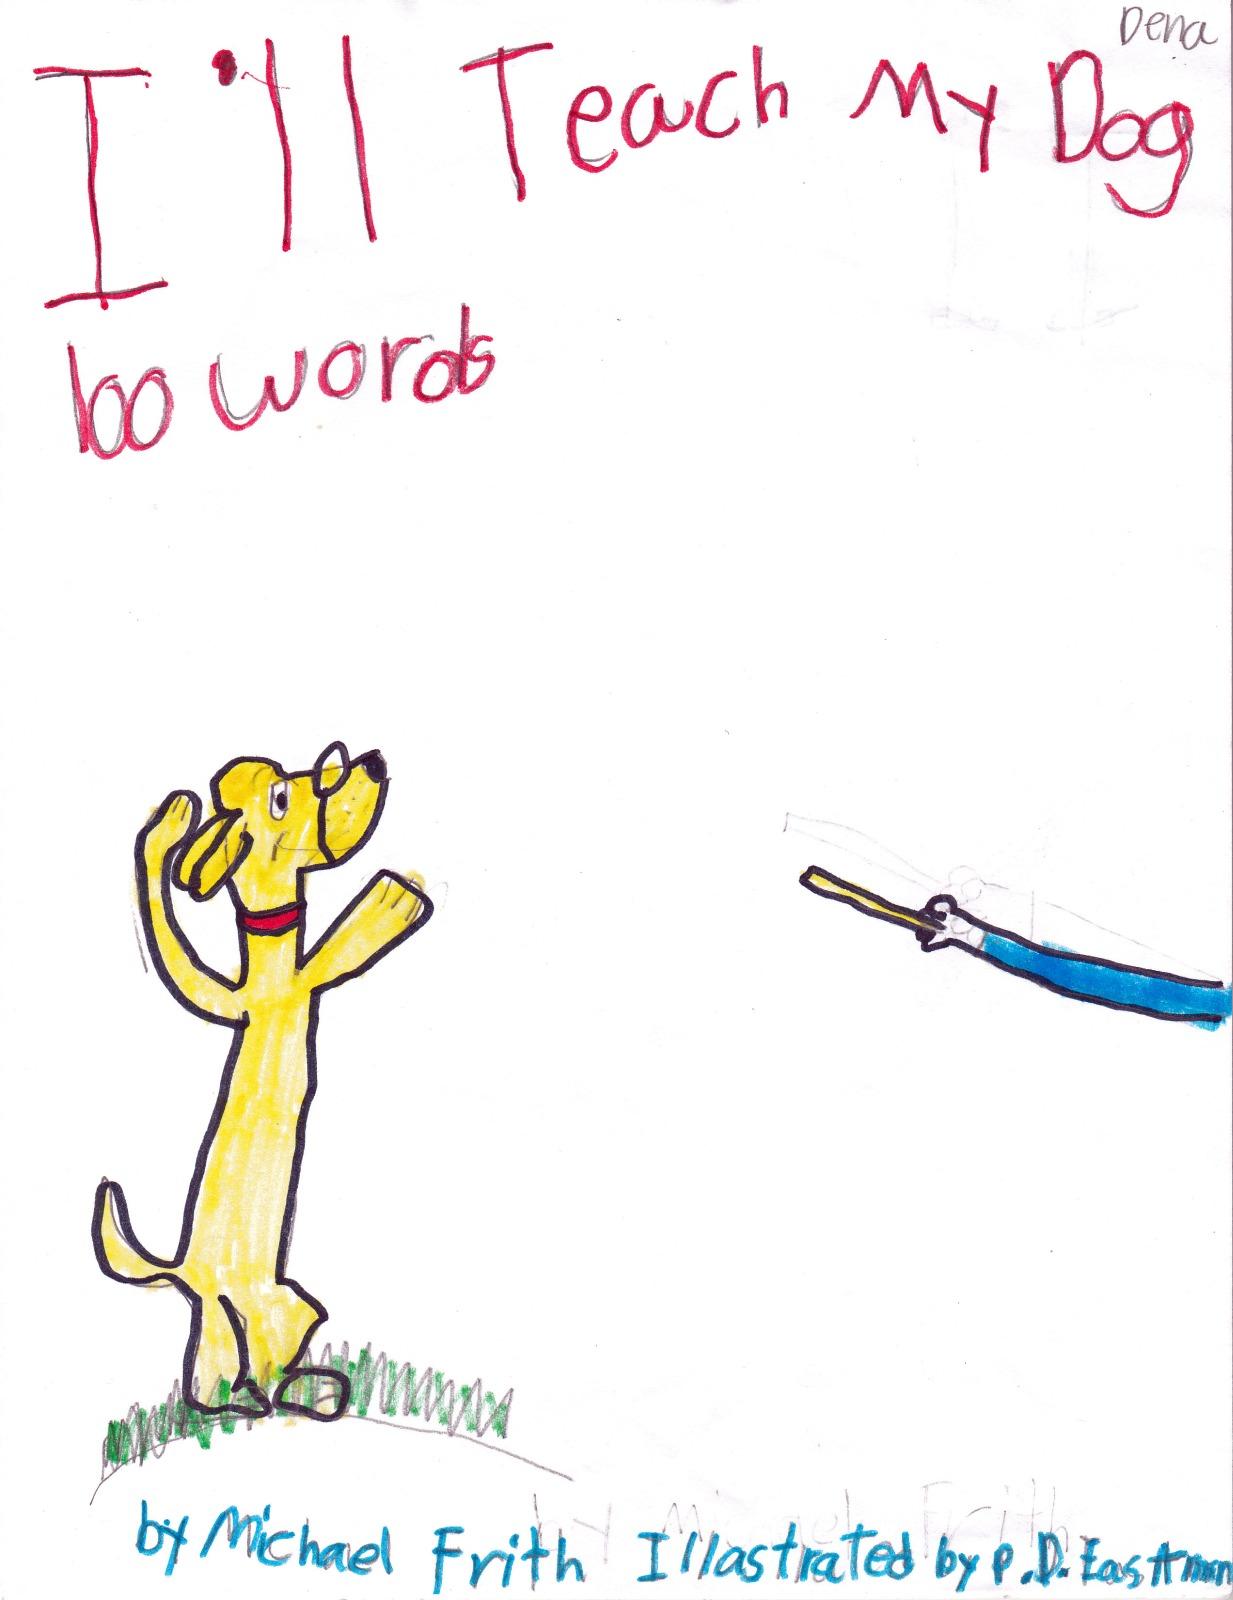 DotWK: I'll Teach My Dog 100 Words, artwork by Dena Her